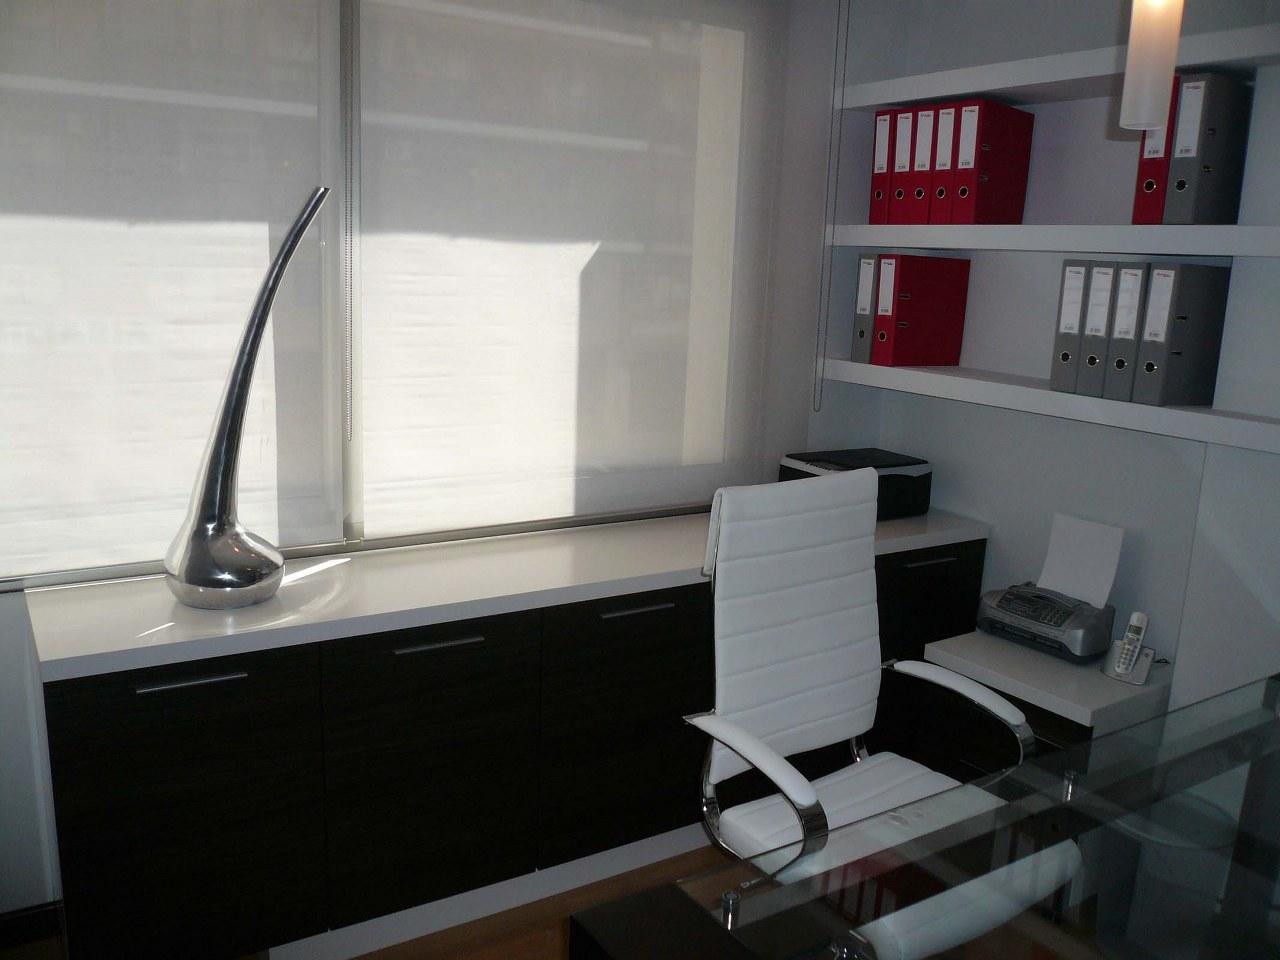 Sevilla despachos legalex ac2bcn estudio de - Estudios de arquitectura en sevilla ...